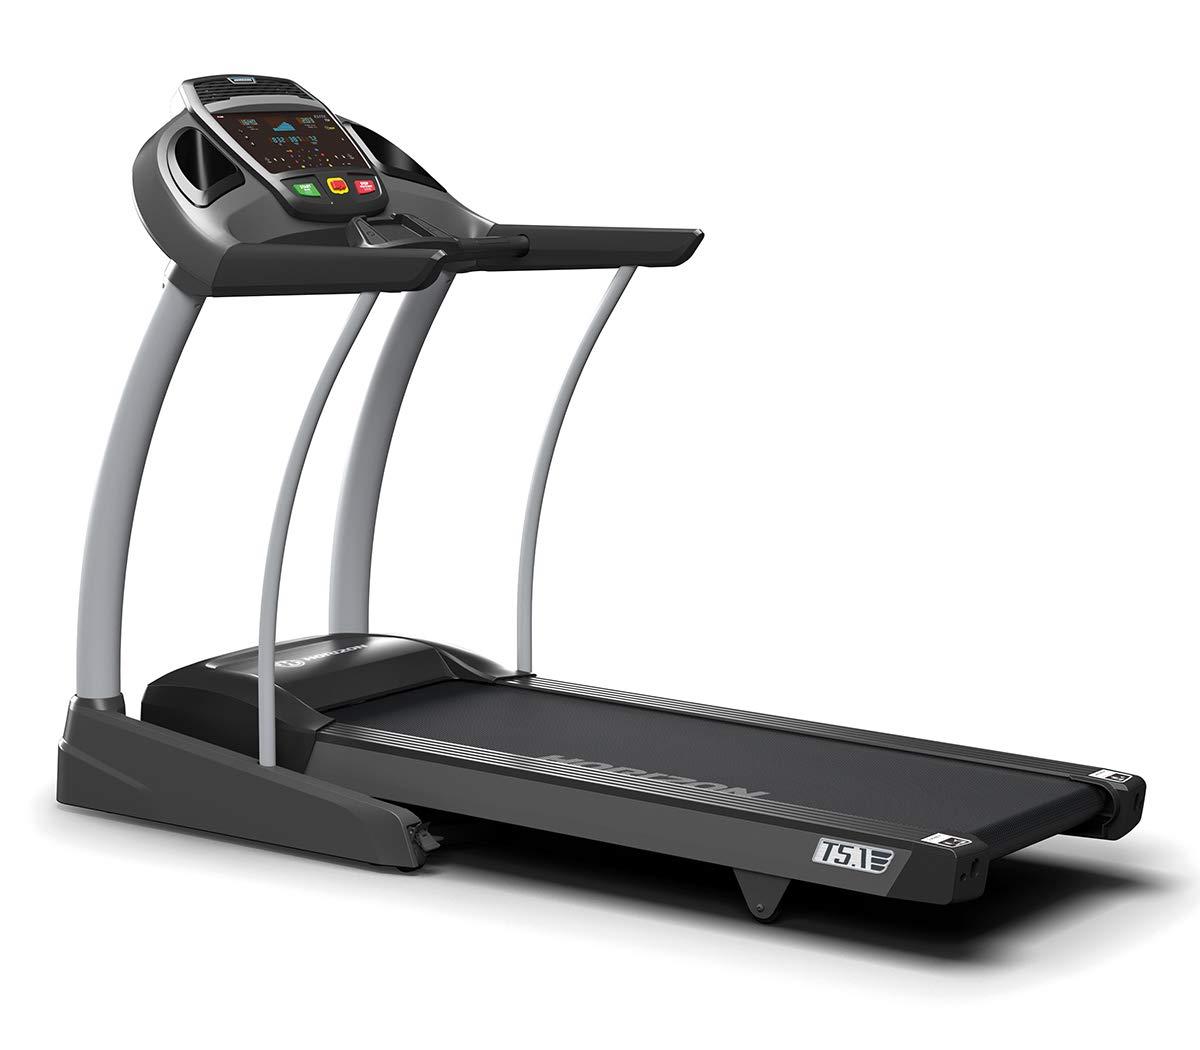 Horizon Fitness Bieżnia Elite T5.1 Vi: Amazon.es: Deportes y aire ...